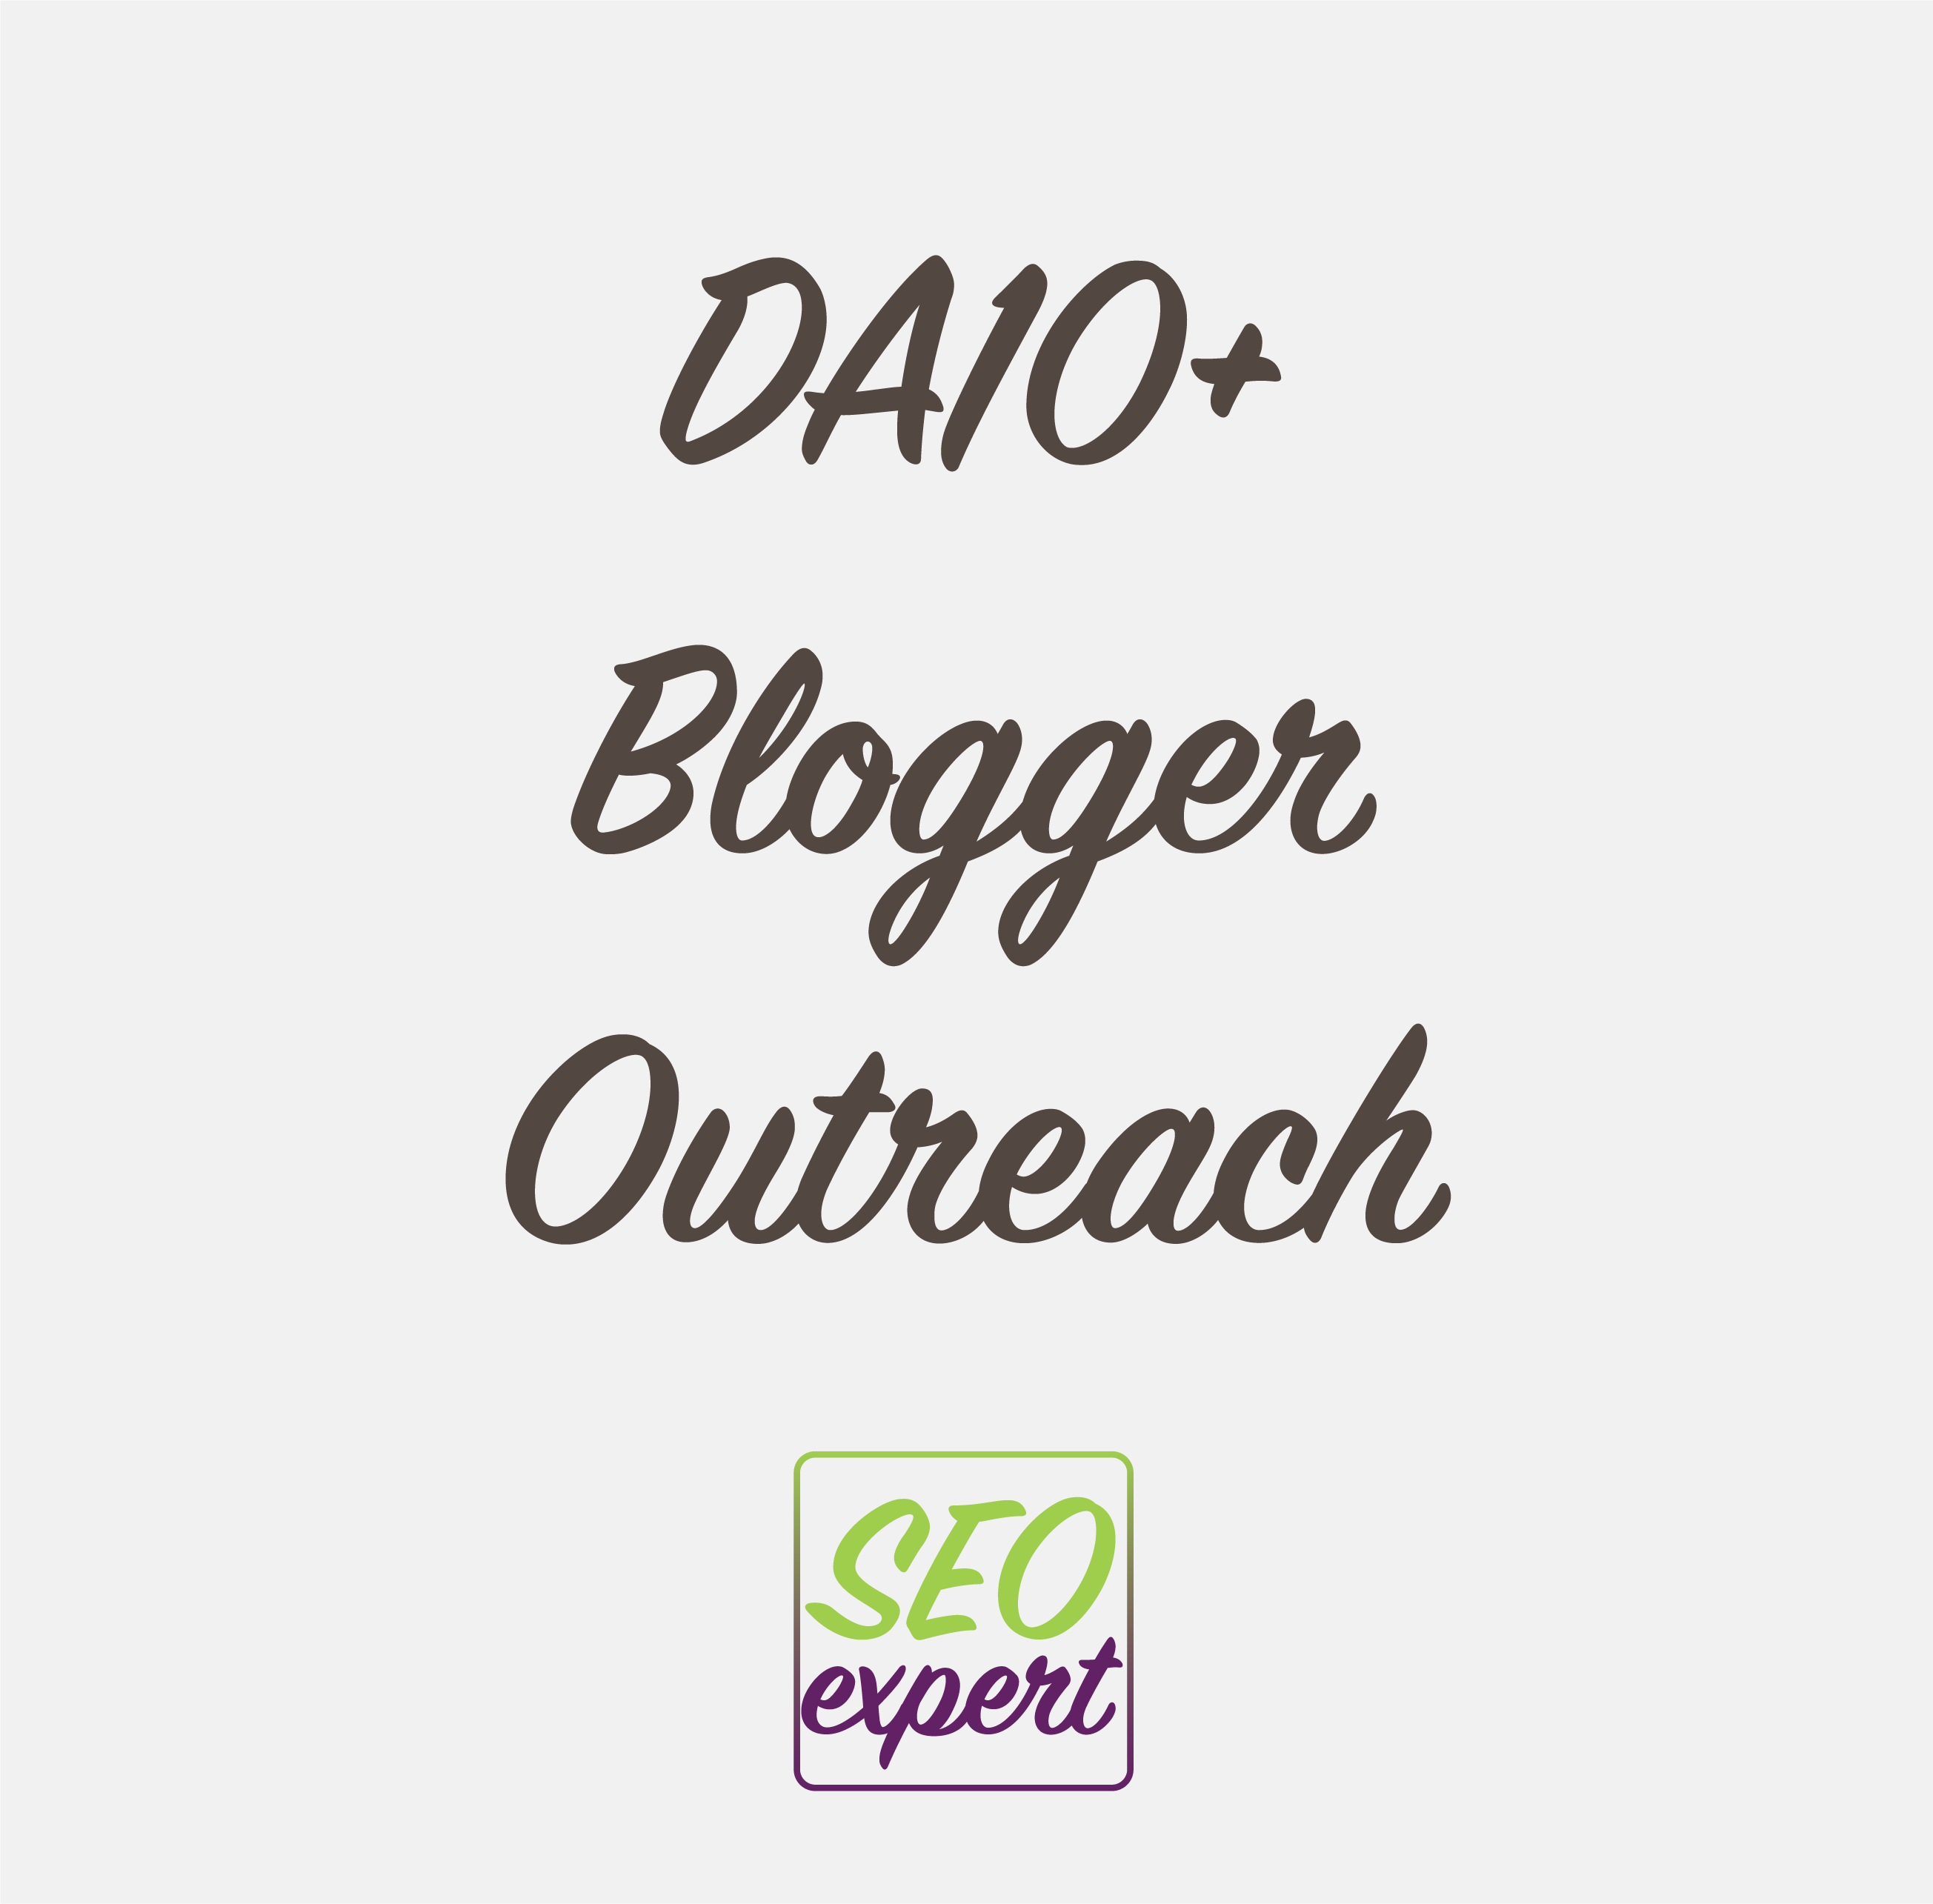 Blogger Outreach Services - Professional Service - DA40 and DA50+